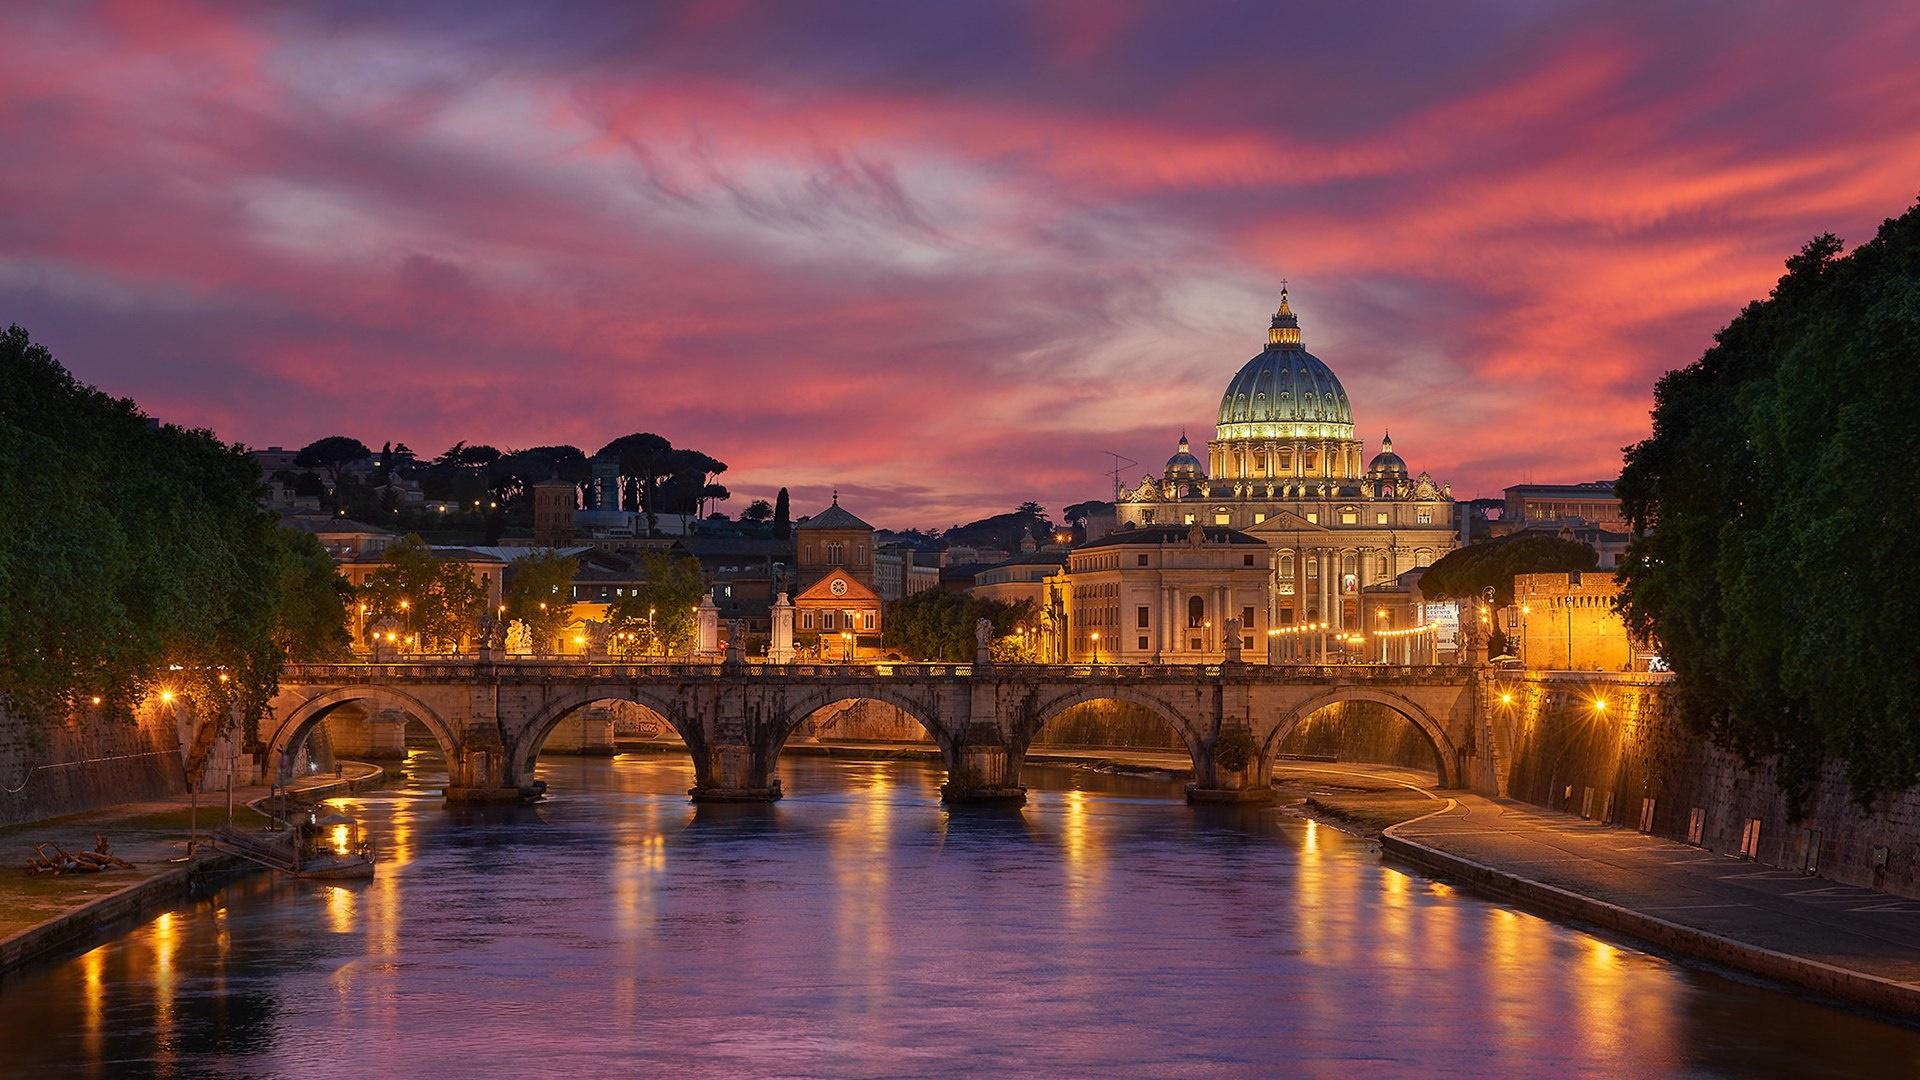 St. Angelo Bridge and St. Peter's Basilica wallpaper